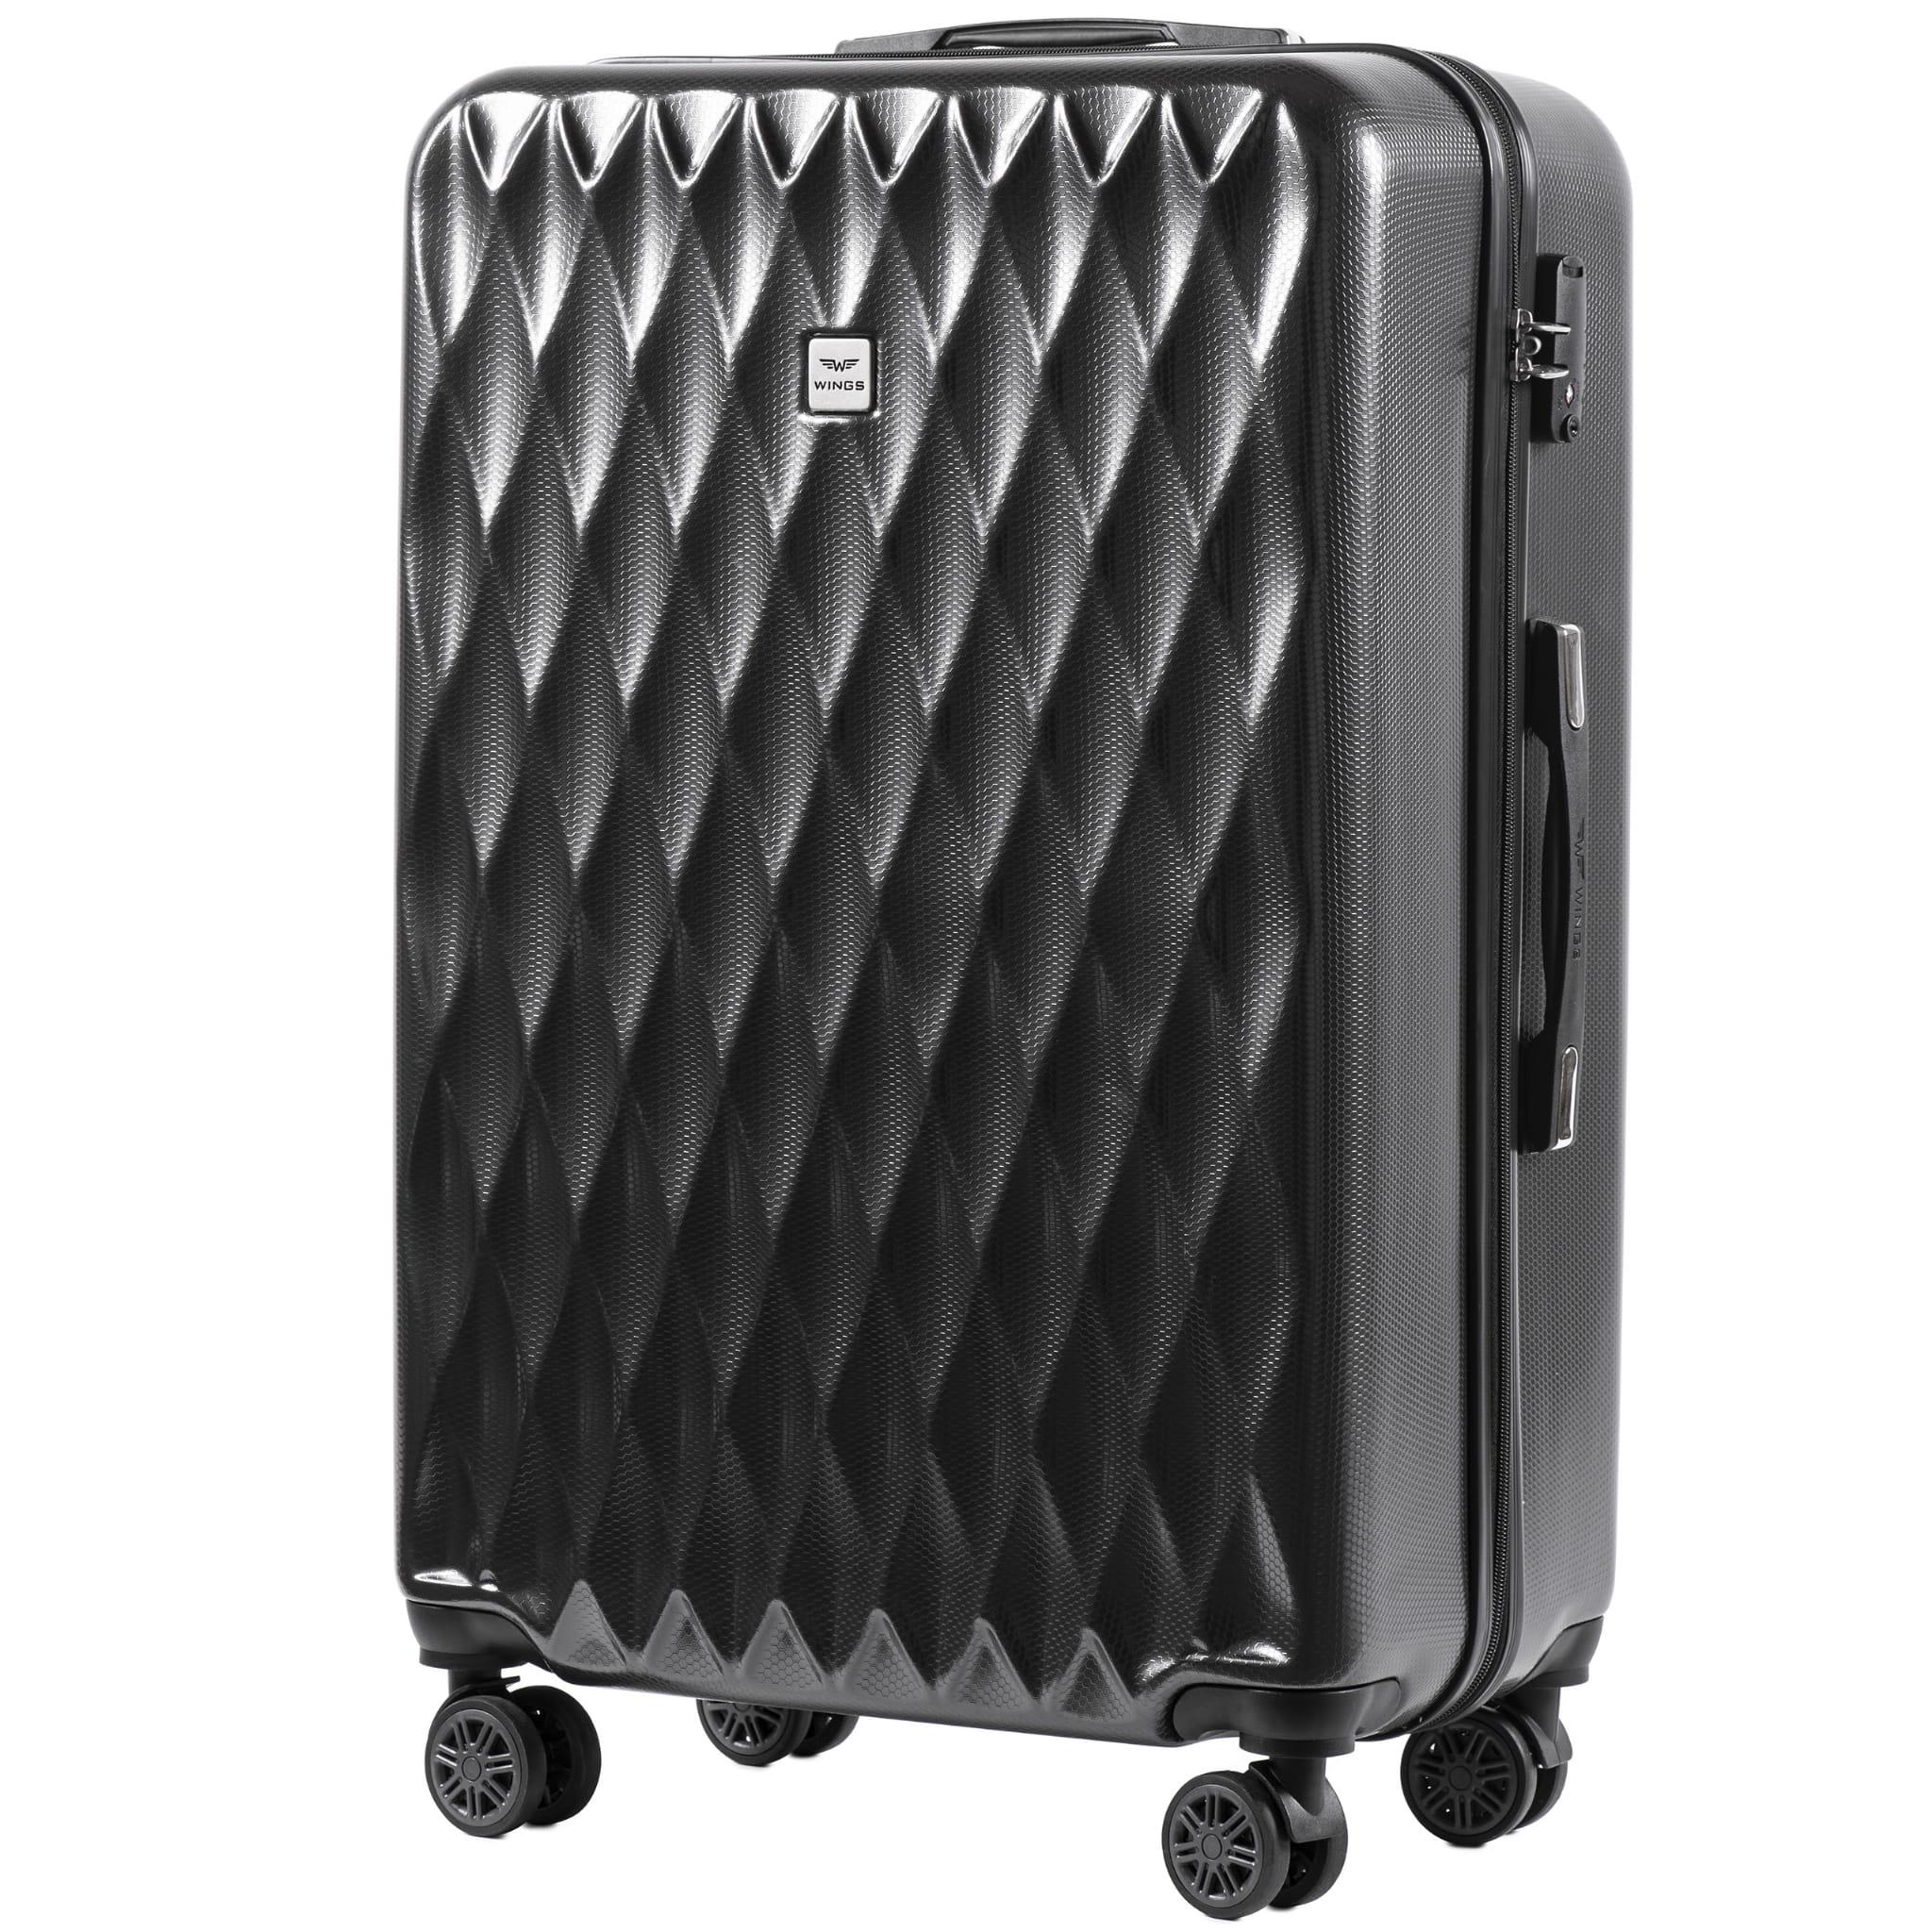 БОЛЬШОЙ ЧЕМОДАН WINGS PC190 L DARK GREY  PREMIUM НА 4-Х КАУЧУКОВЫХ КОЛЕСАХ! Для багажа ,до 23 кг!